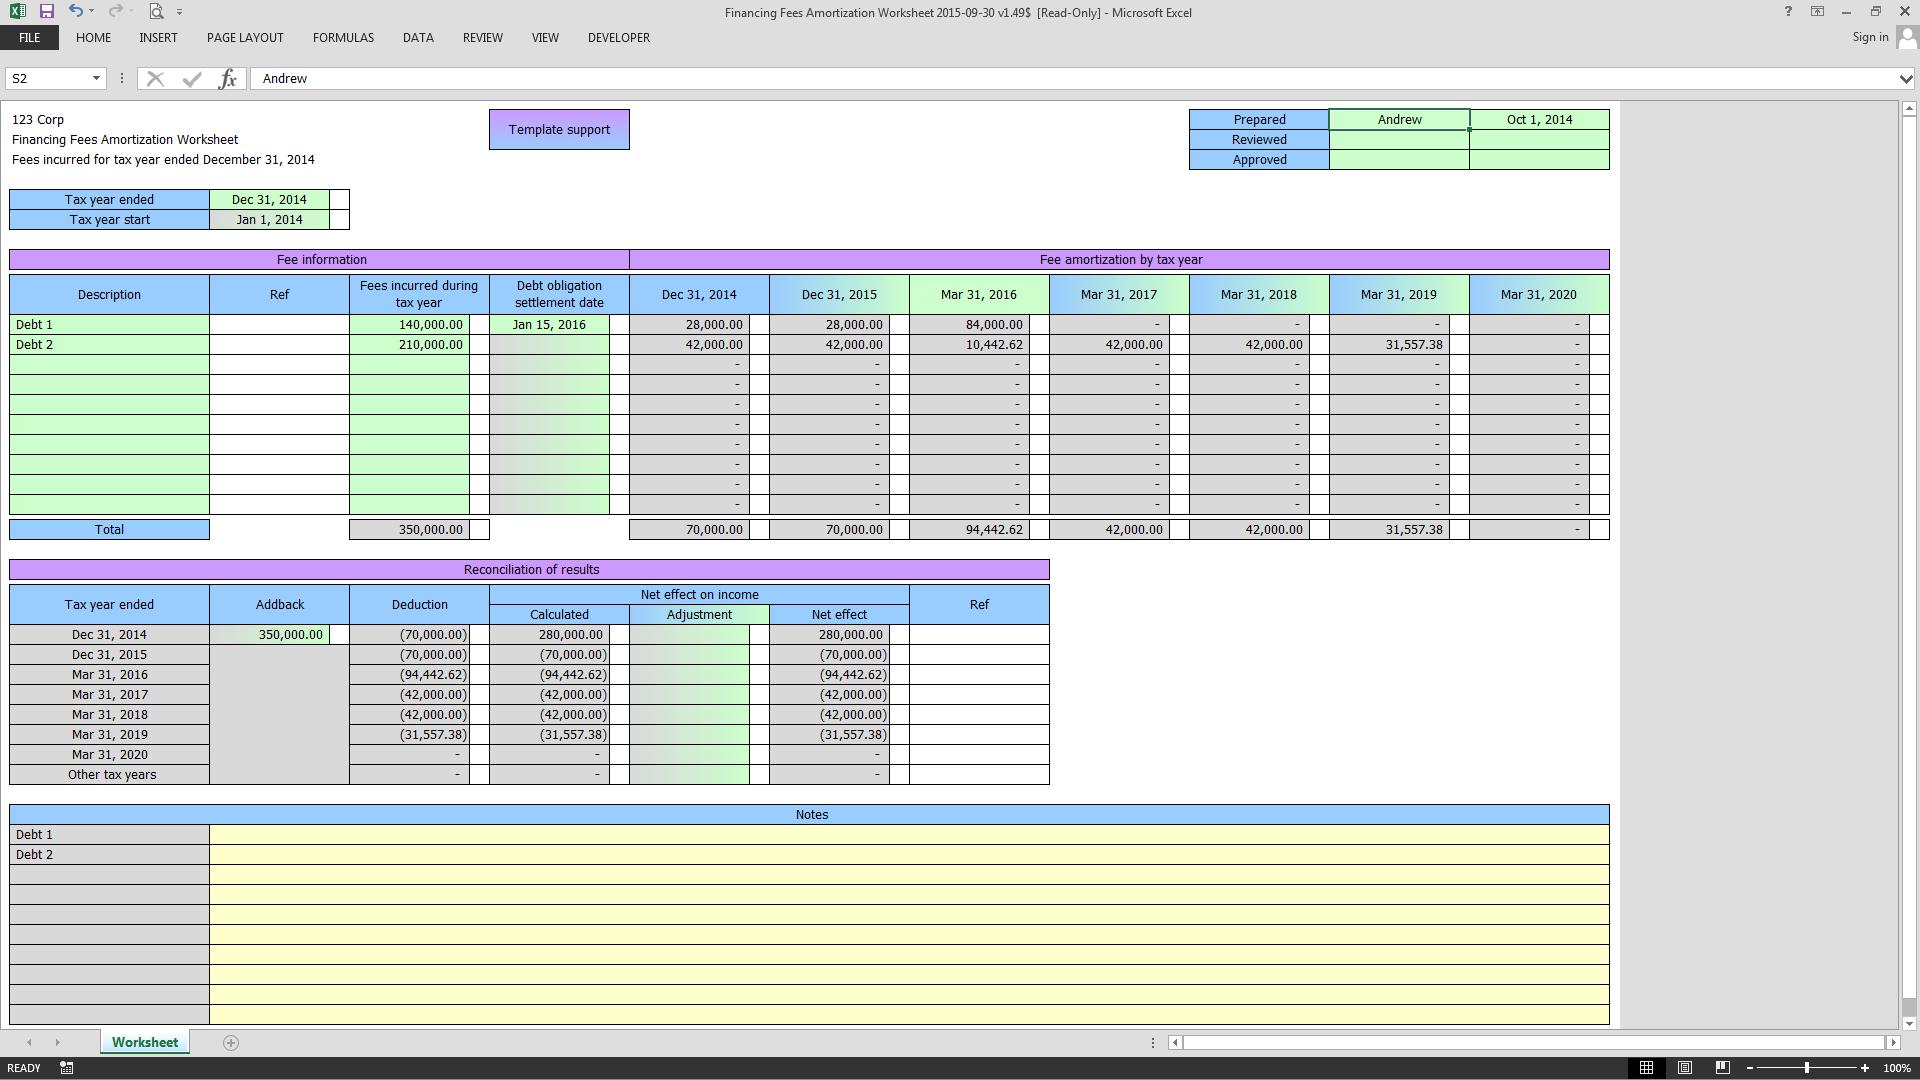 Financing Fees Amortization Worksheet